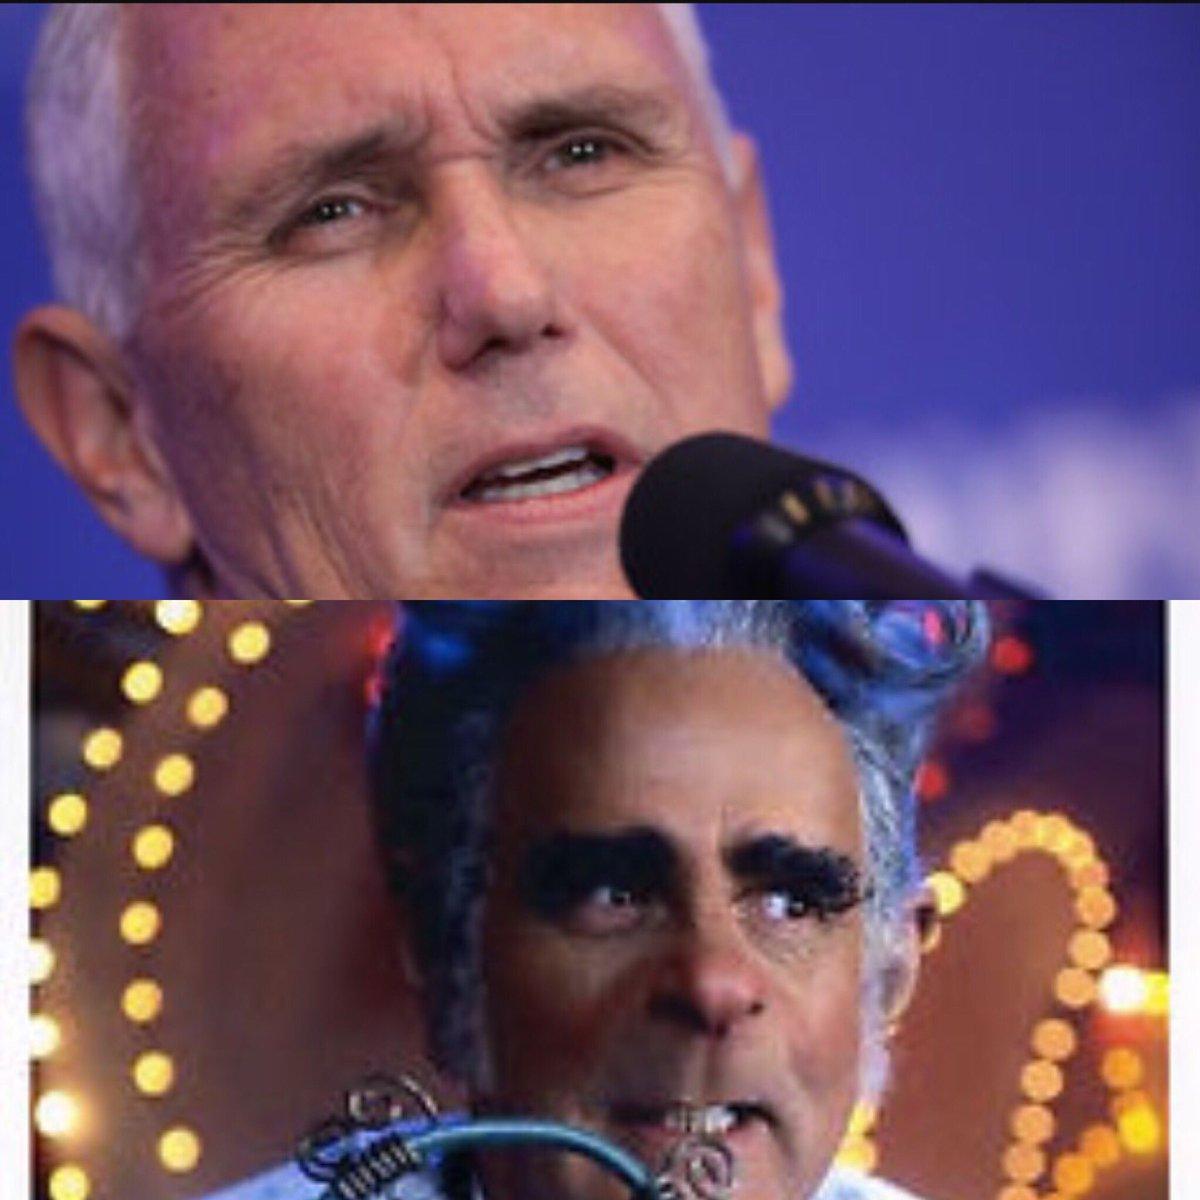 The Grinch Who Stole Christmas Mayor.Robb Fowler On Twitter Mike Pence Looks Like Mayor